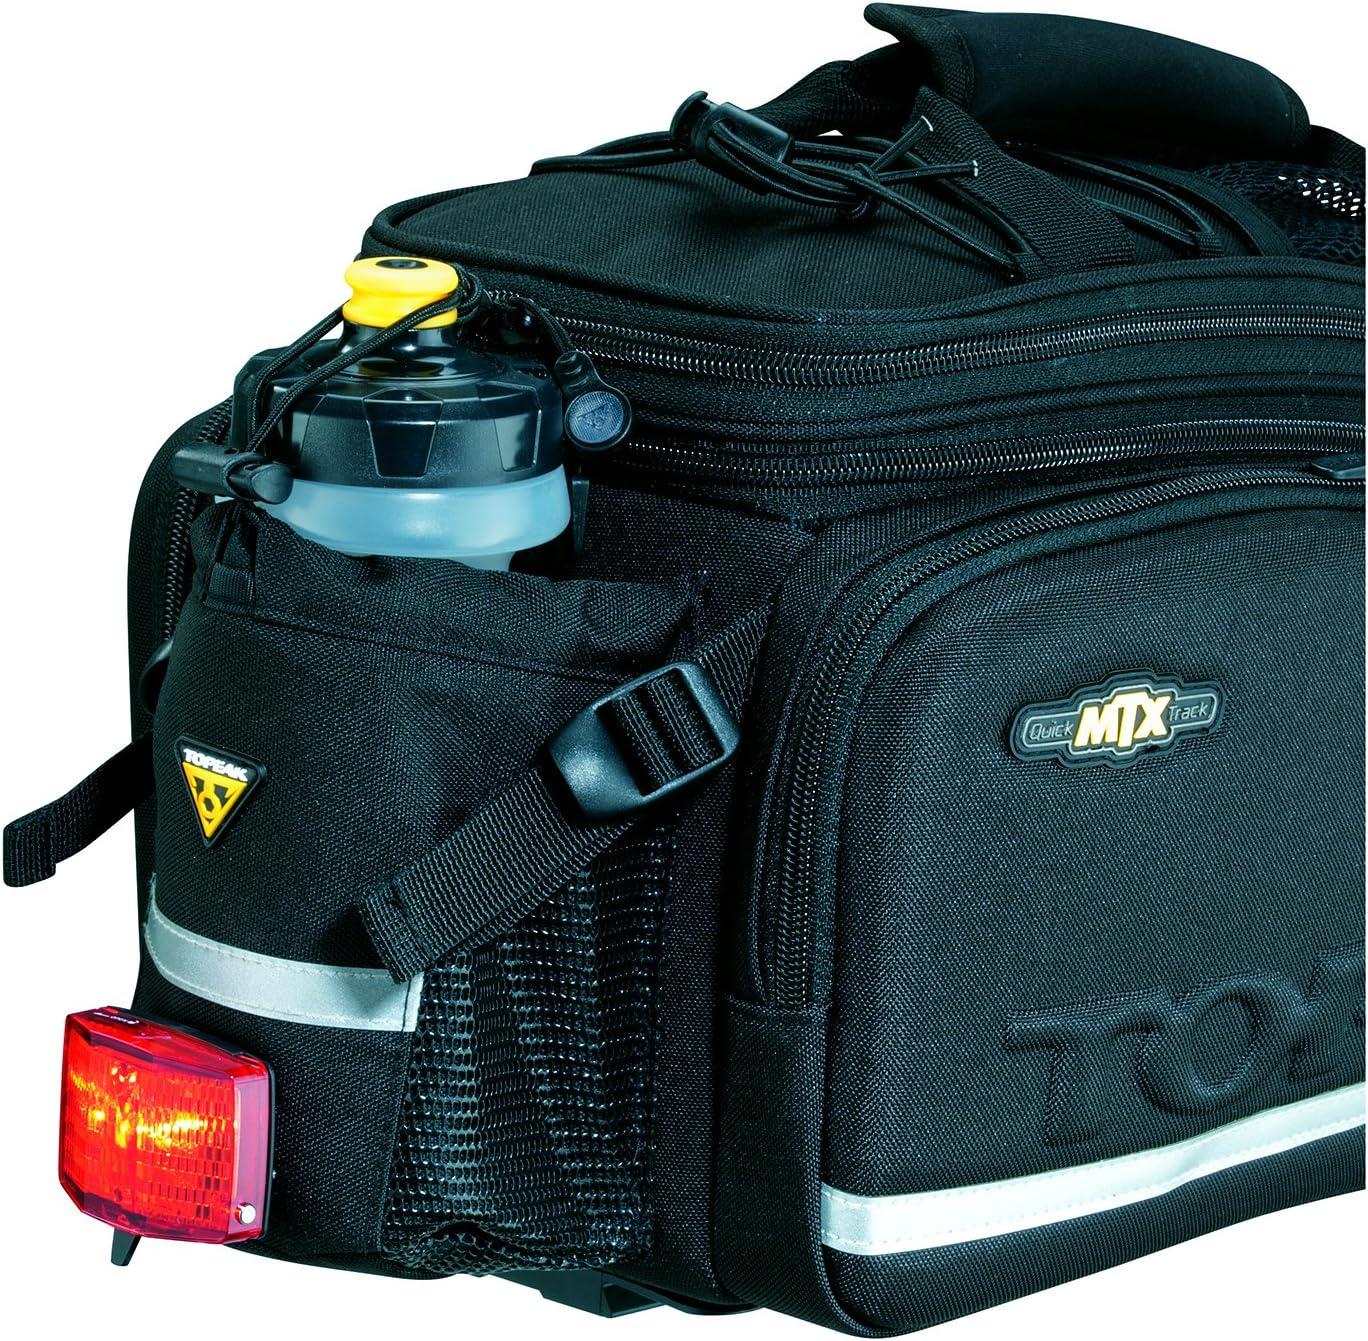 Topeak RX TrunkBag sistema EX equipaje bolsa geplstert equipaje ligero